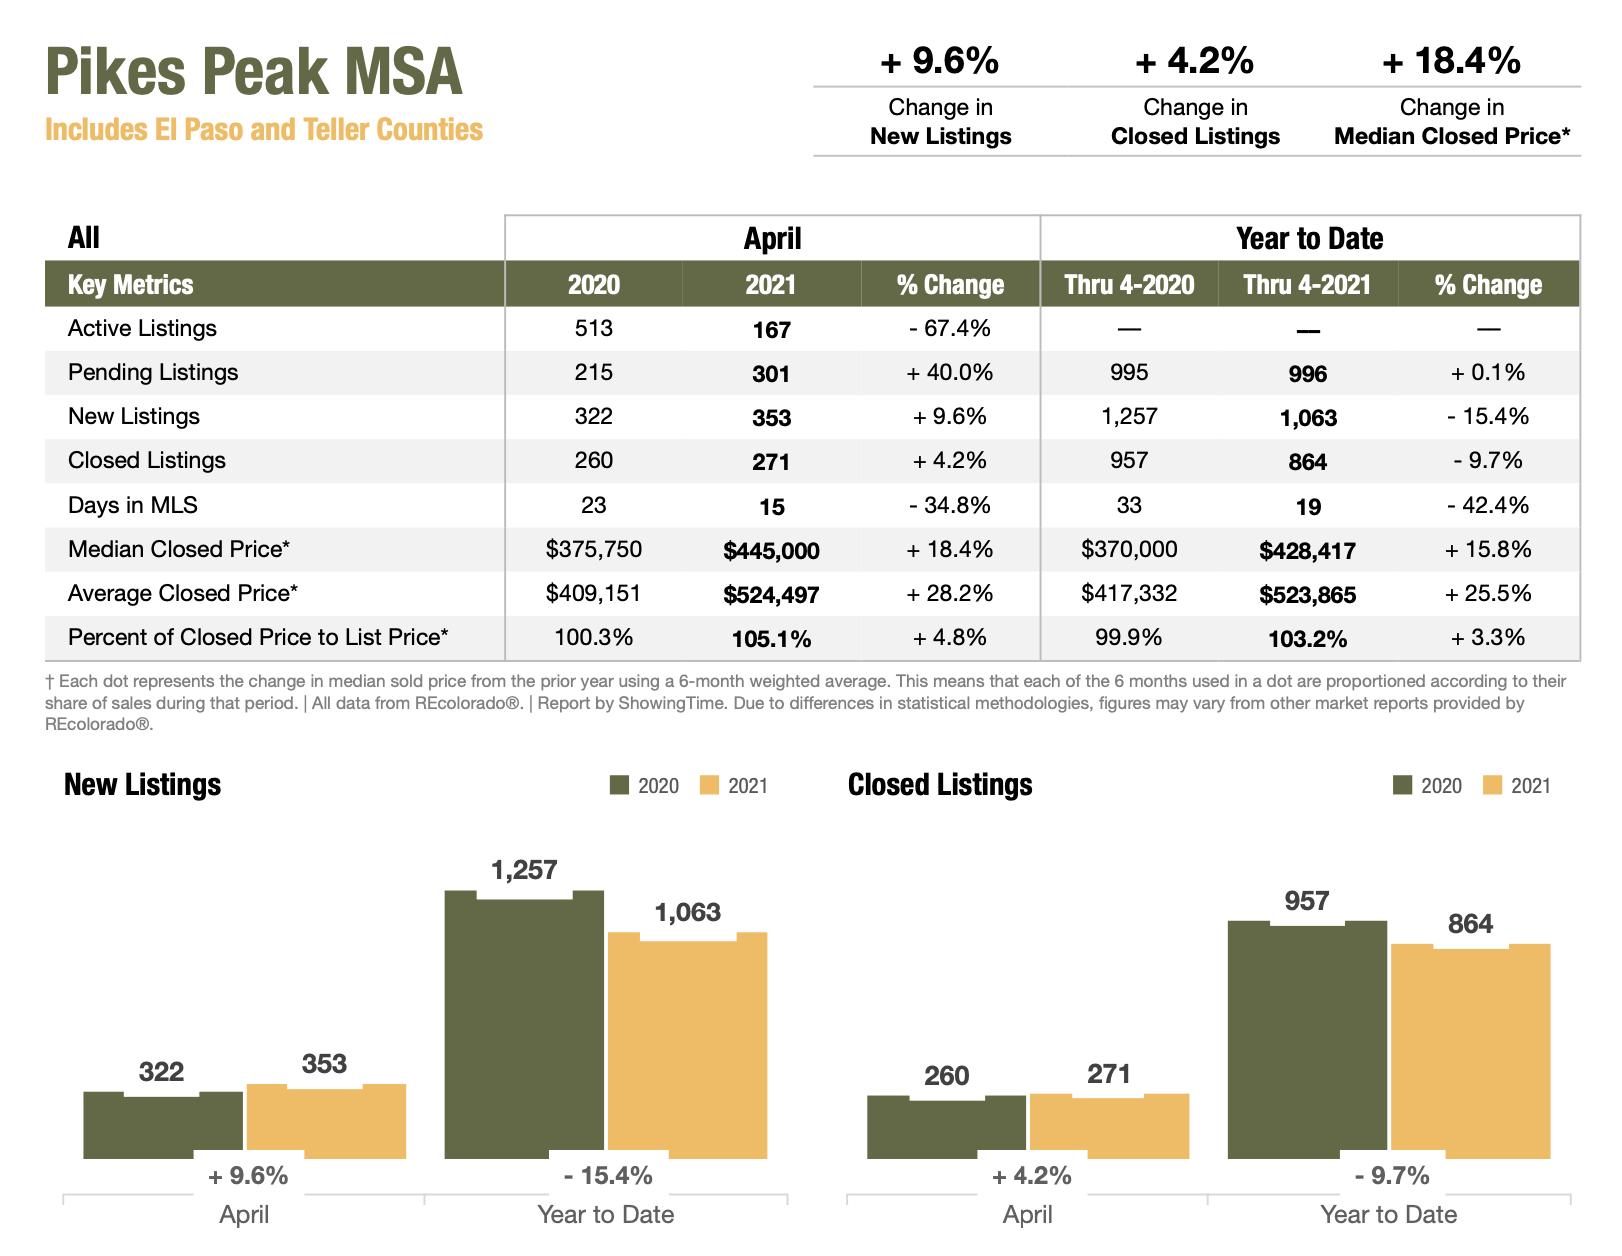 Colorado Real Estate Market Report Pikes Peak MSA April 2021